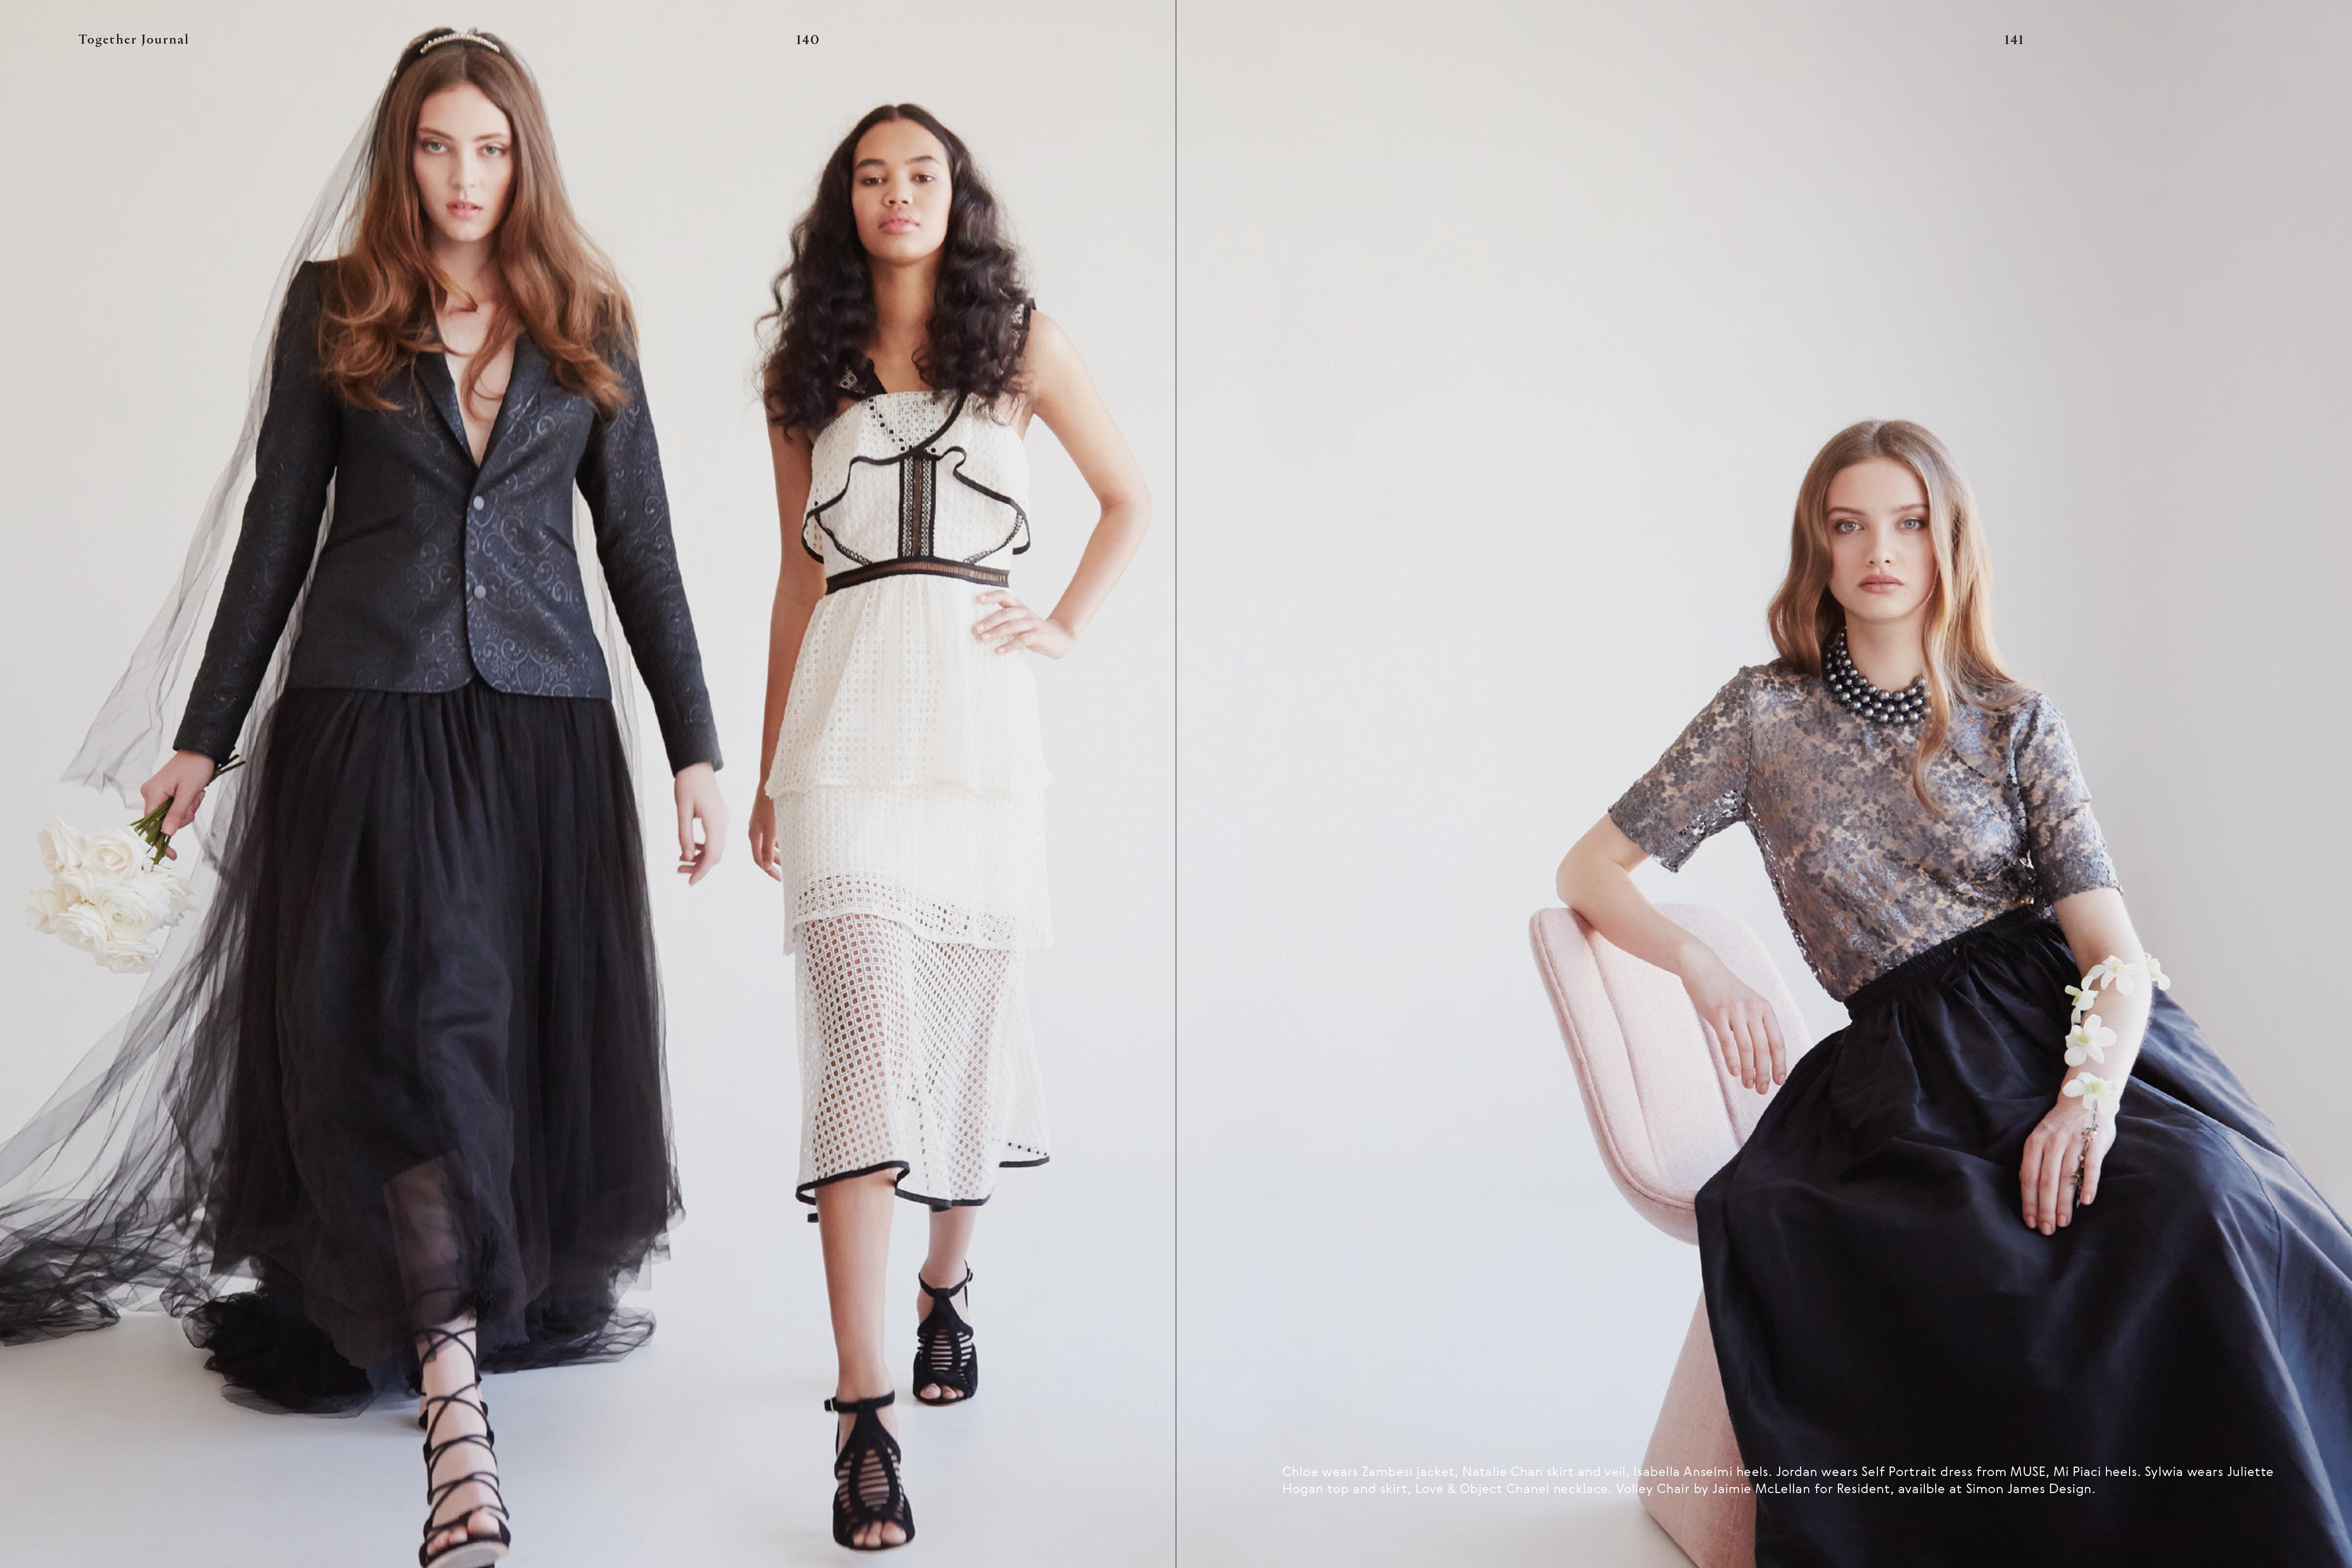 Categories: Fashion-Flora Fashion - Issue 5